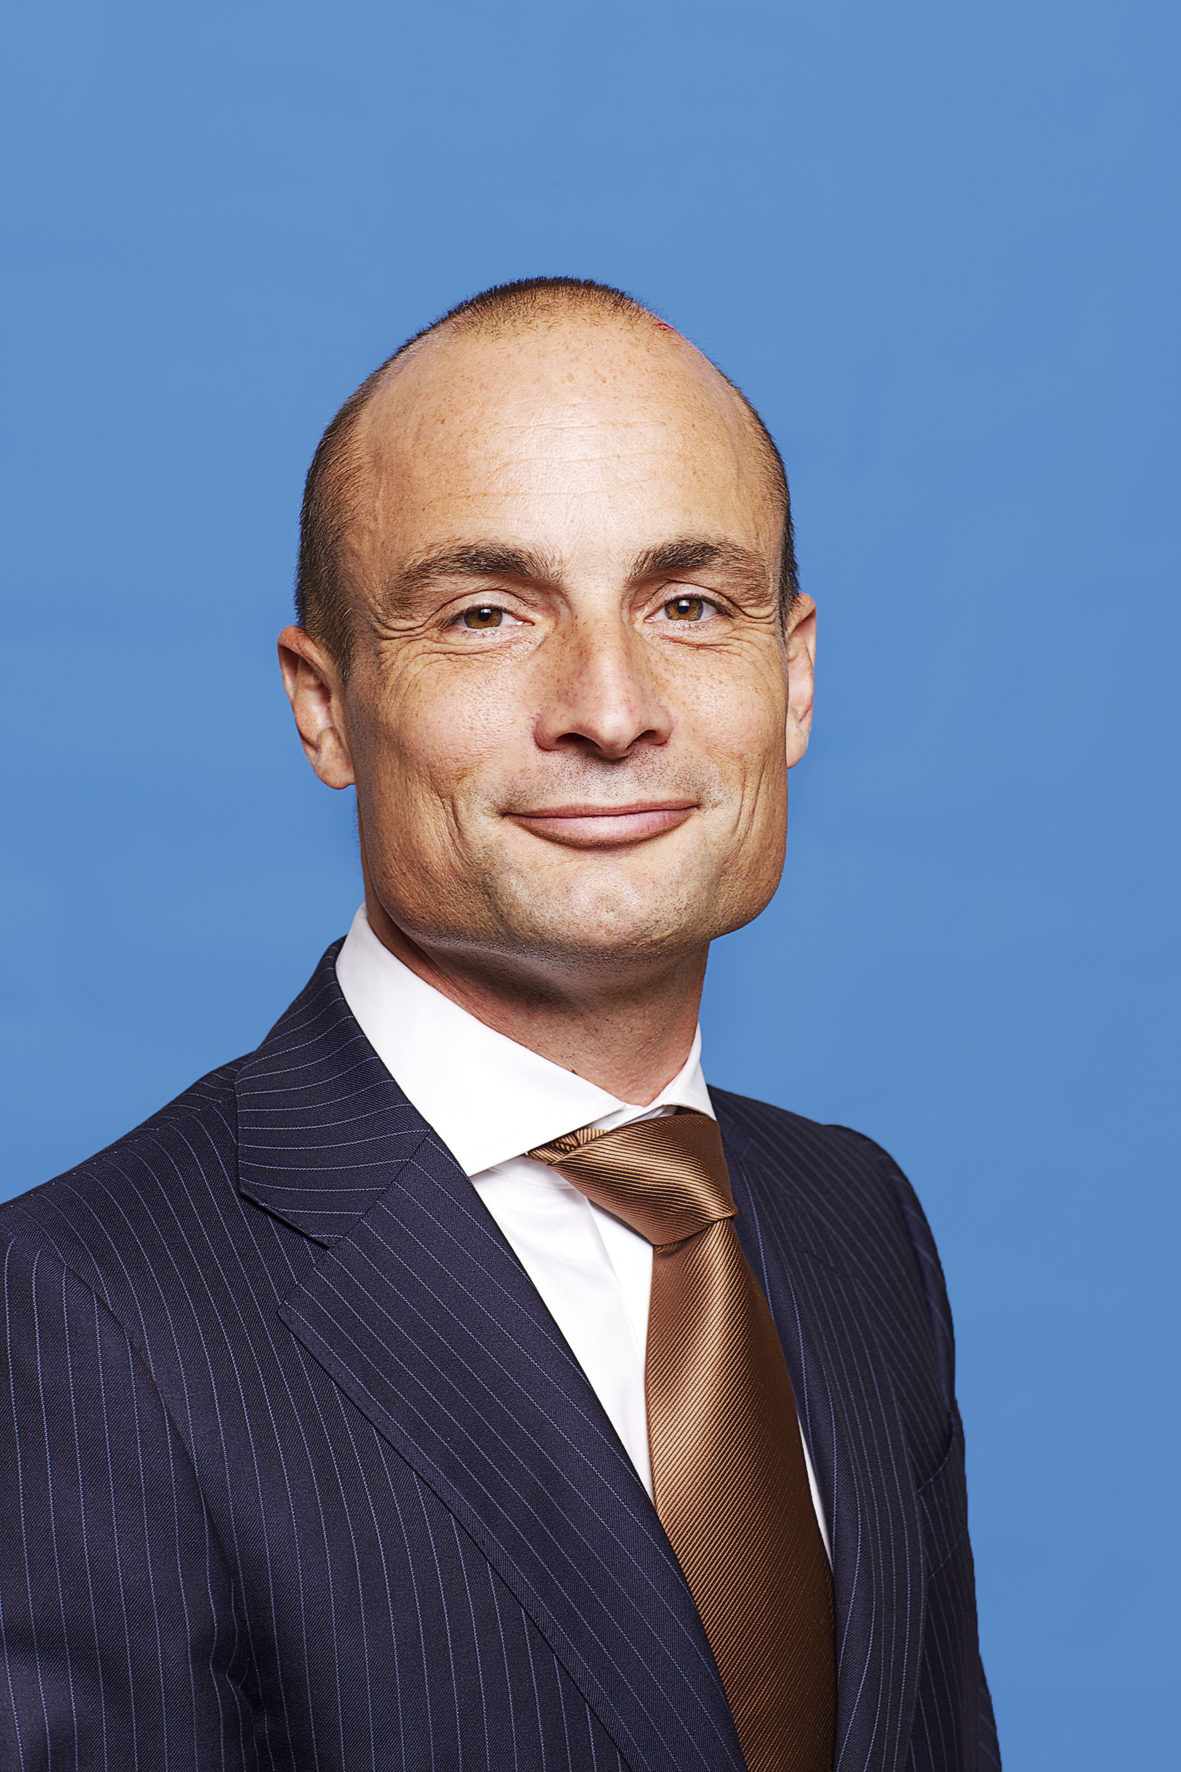 Jan Vos (politician) - Wikipedia